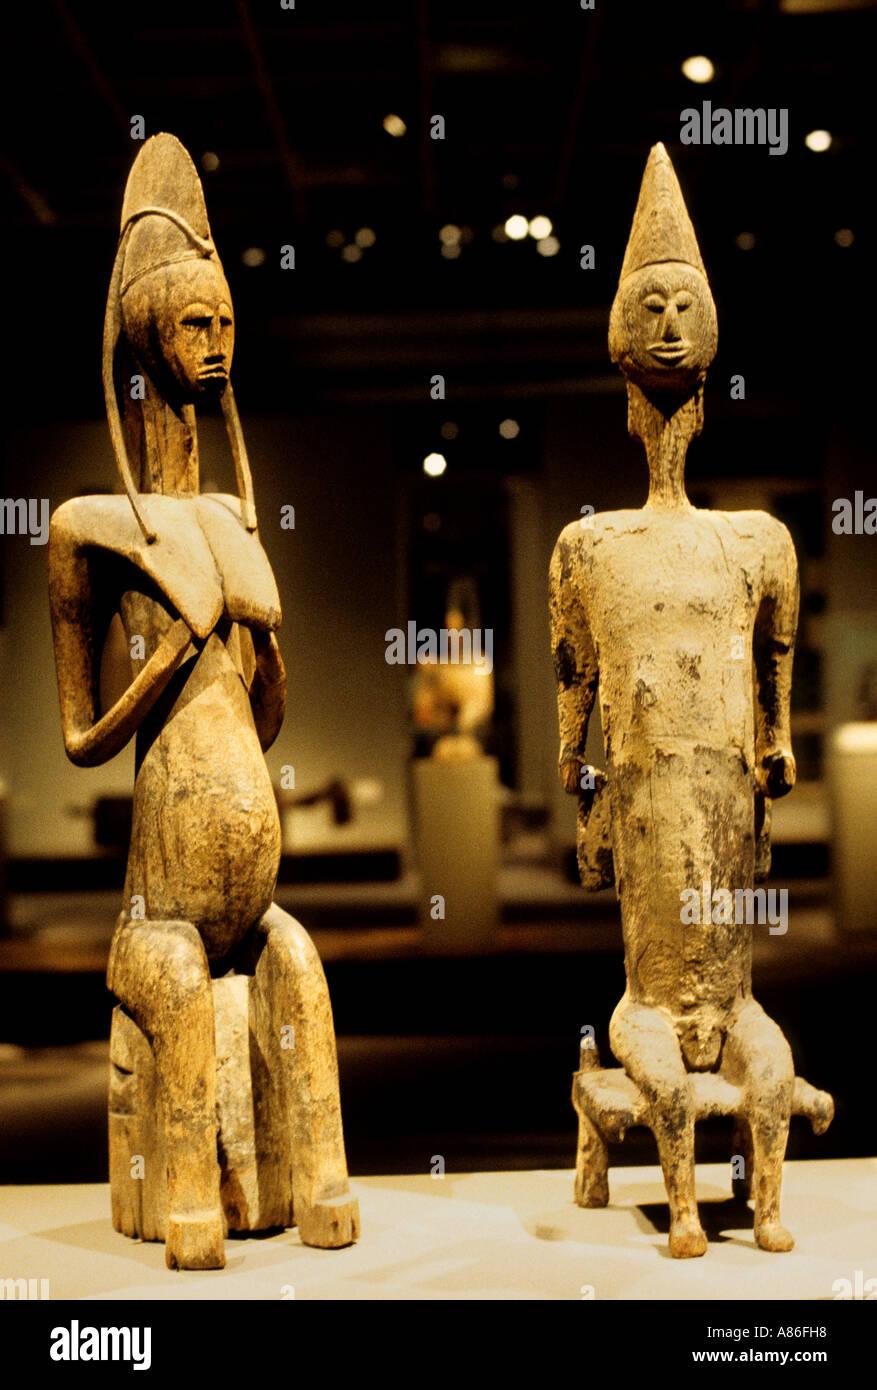 Museum Art  Senufo Ivory Coast Africa African - Stock Image